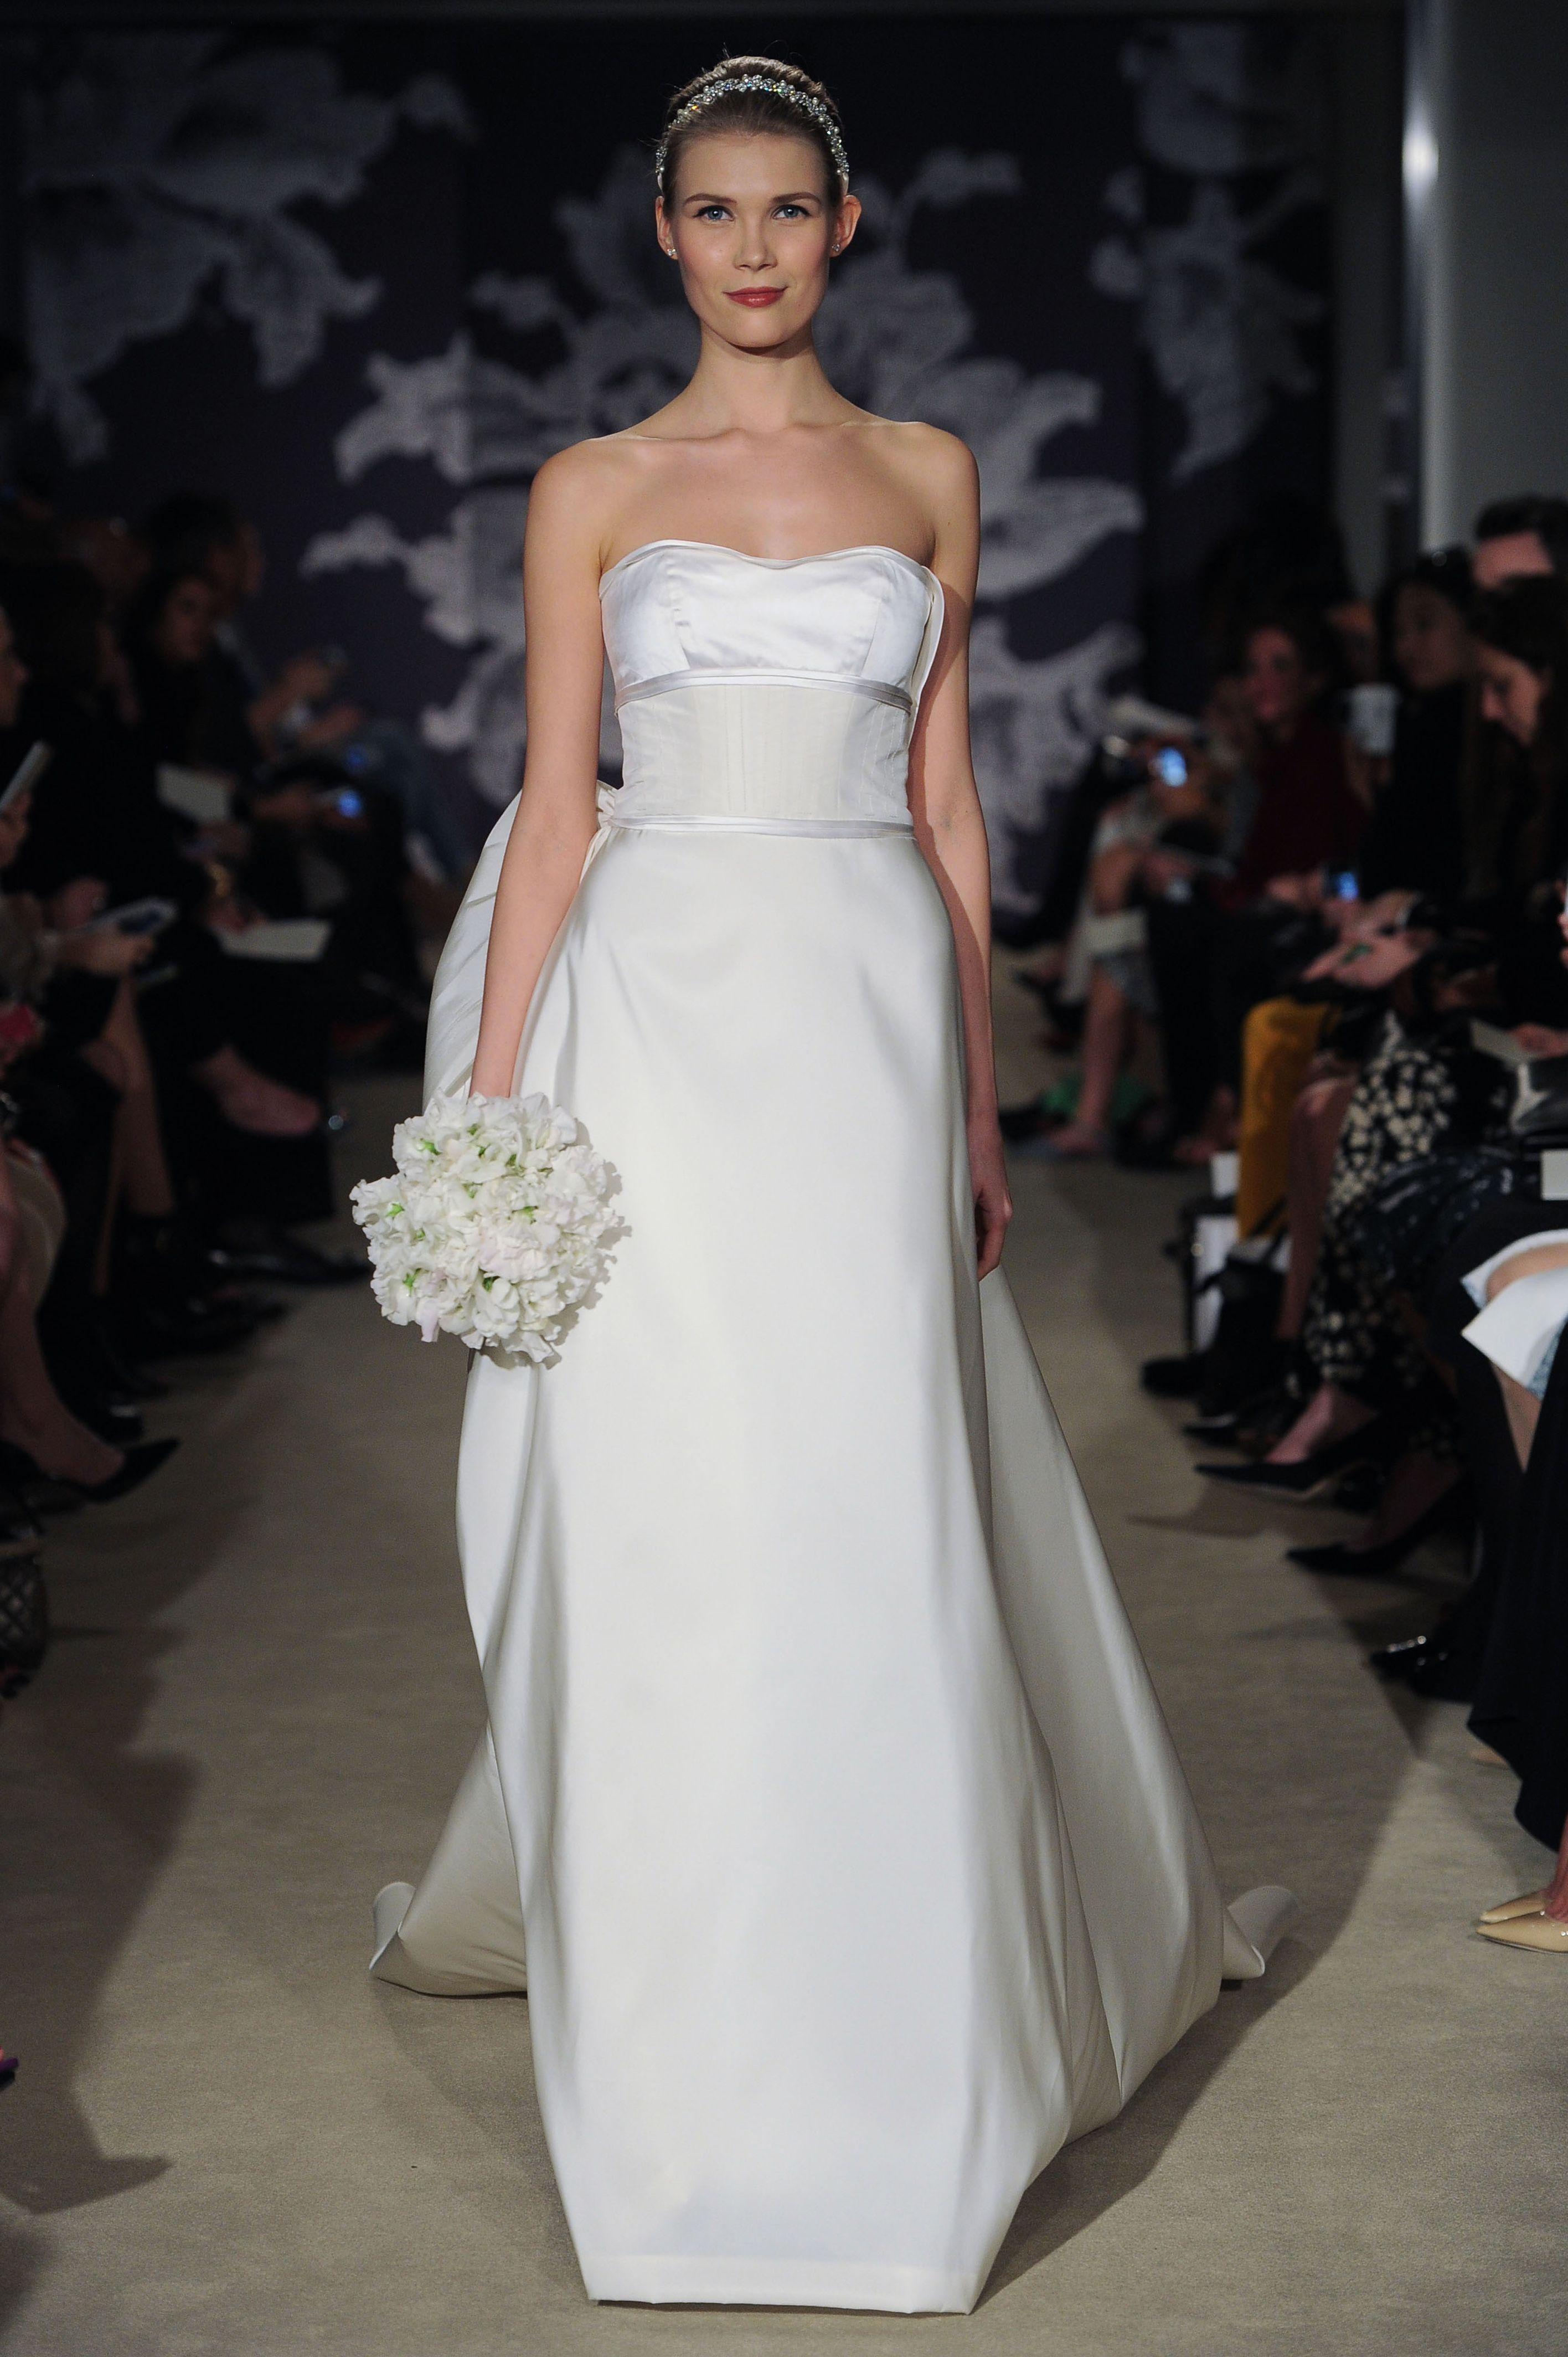 The Carly gown #CarolinaHerrera #bridal